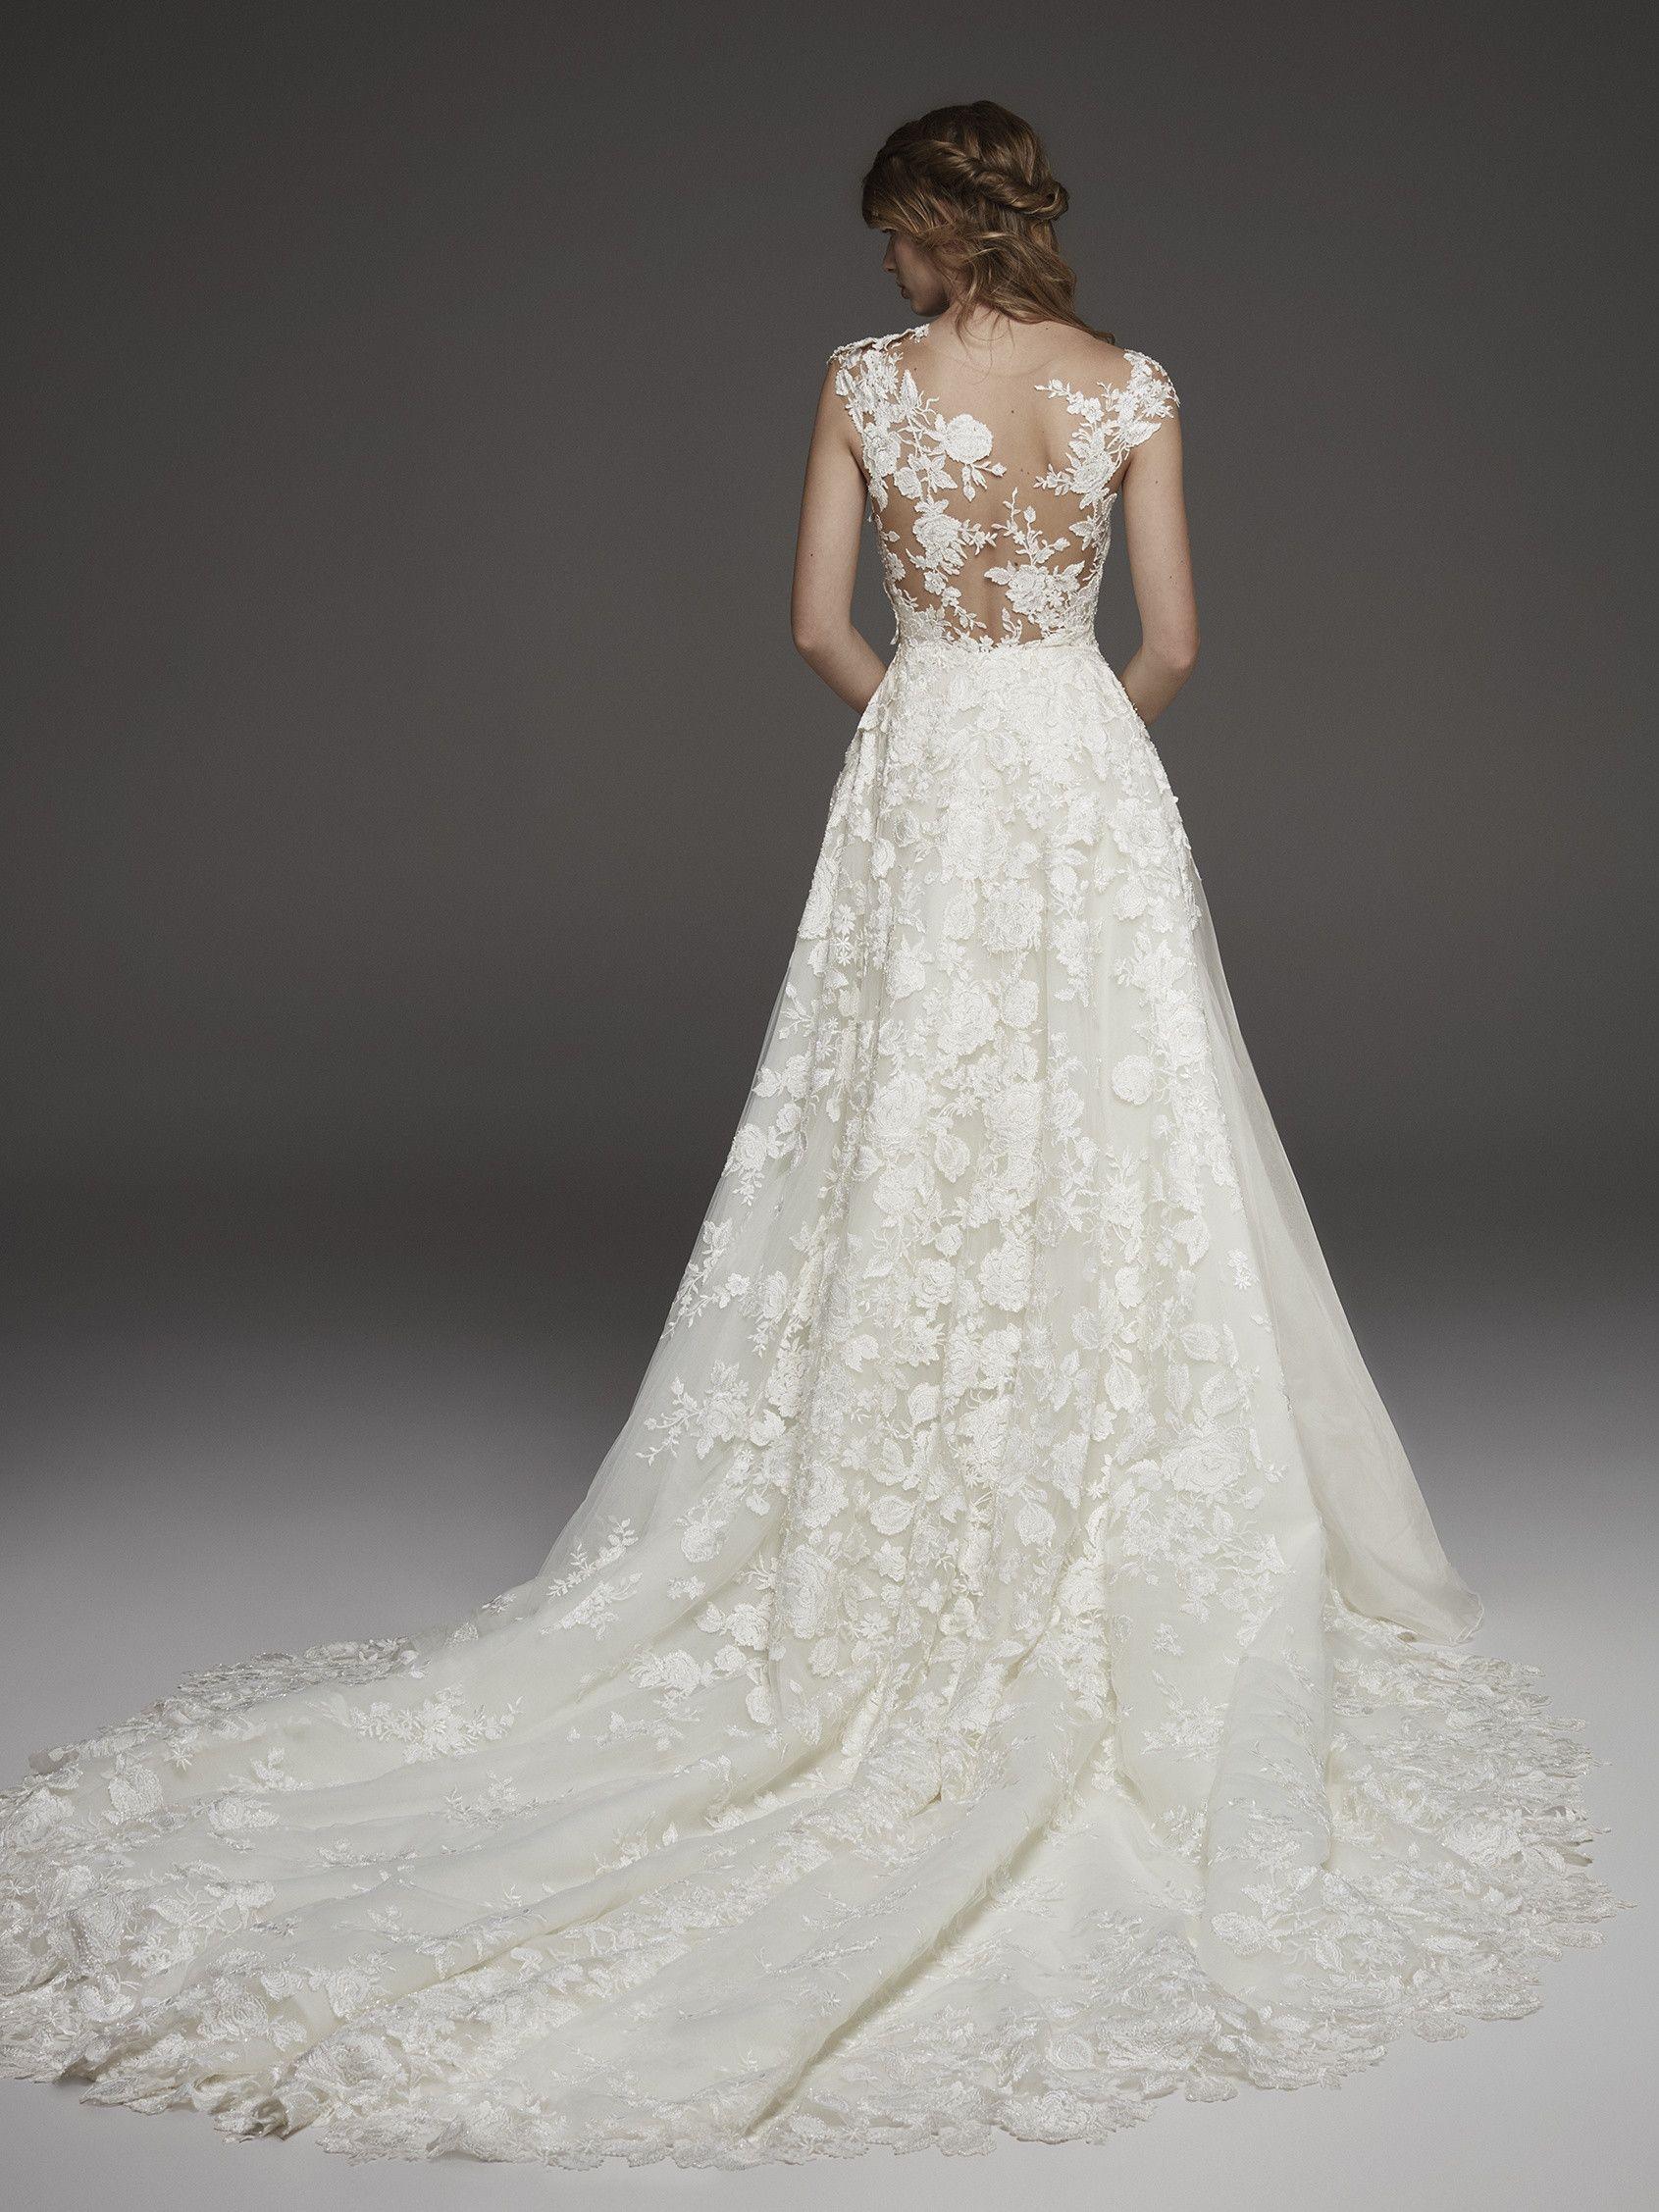 Princess Wedding Dress With Thread Embroidered Flowers Haya Pronovias Wedding Dresses Pronovias Wedding Dress Illusion Wedding Dress